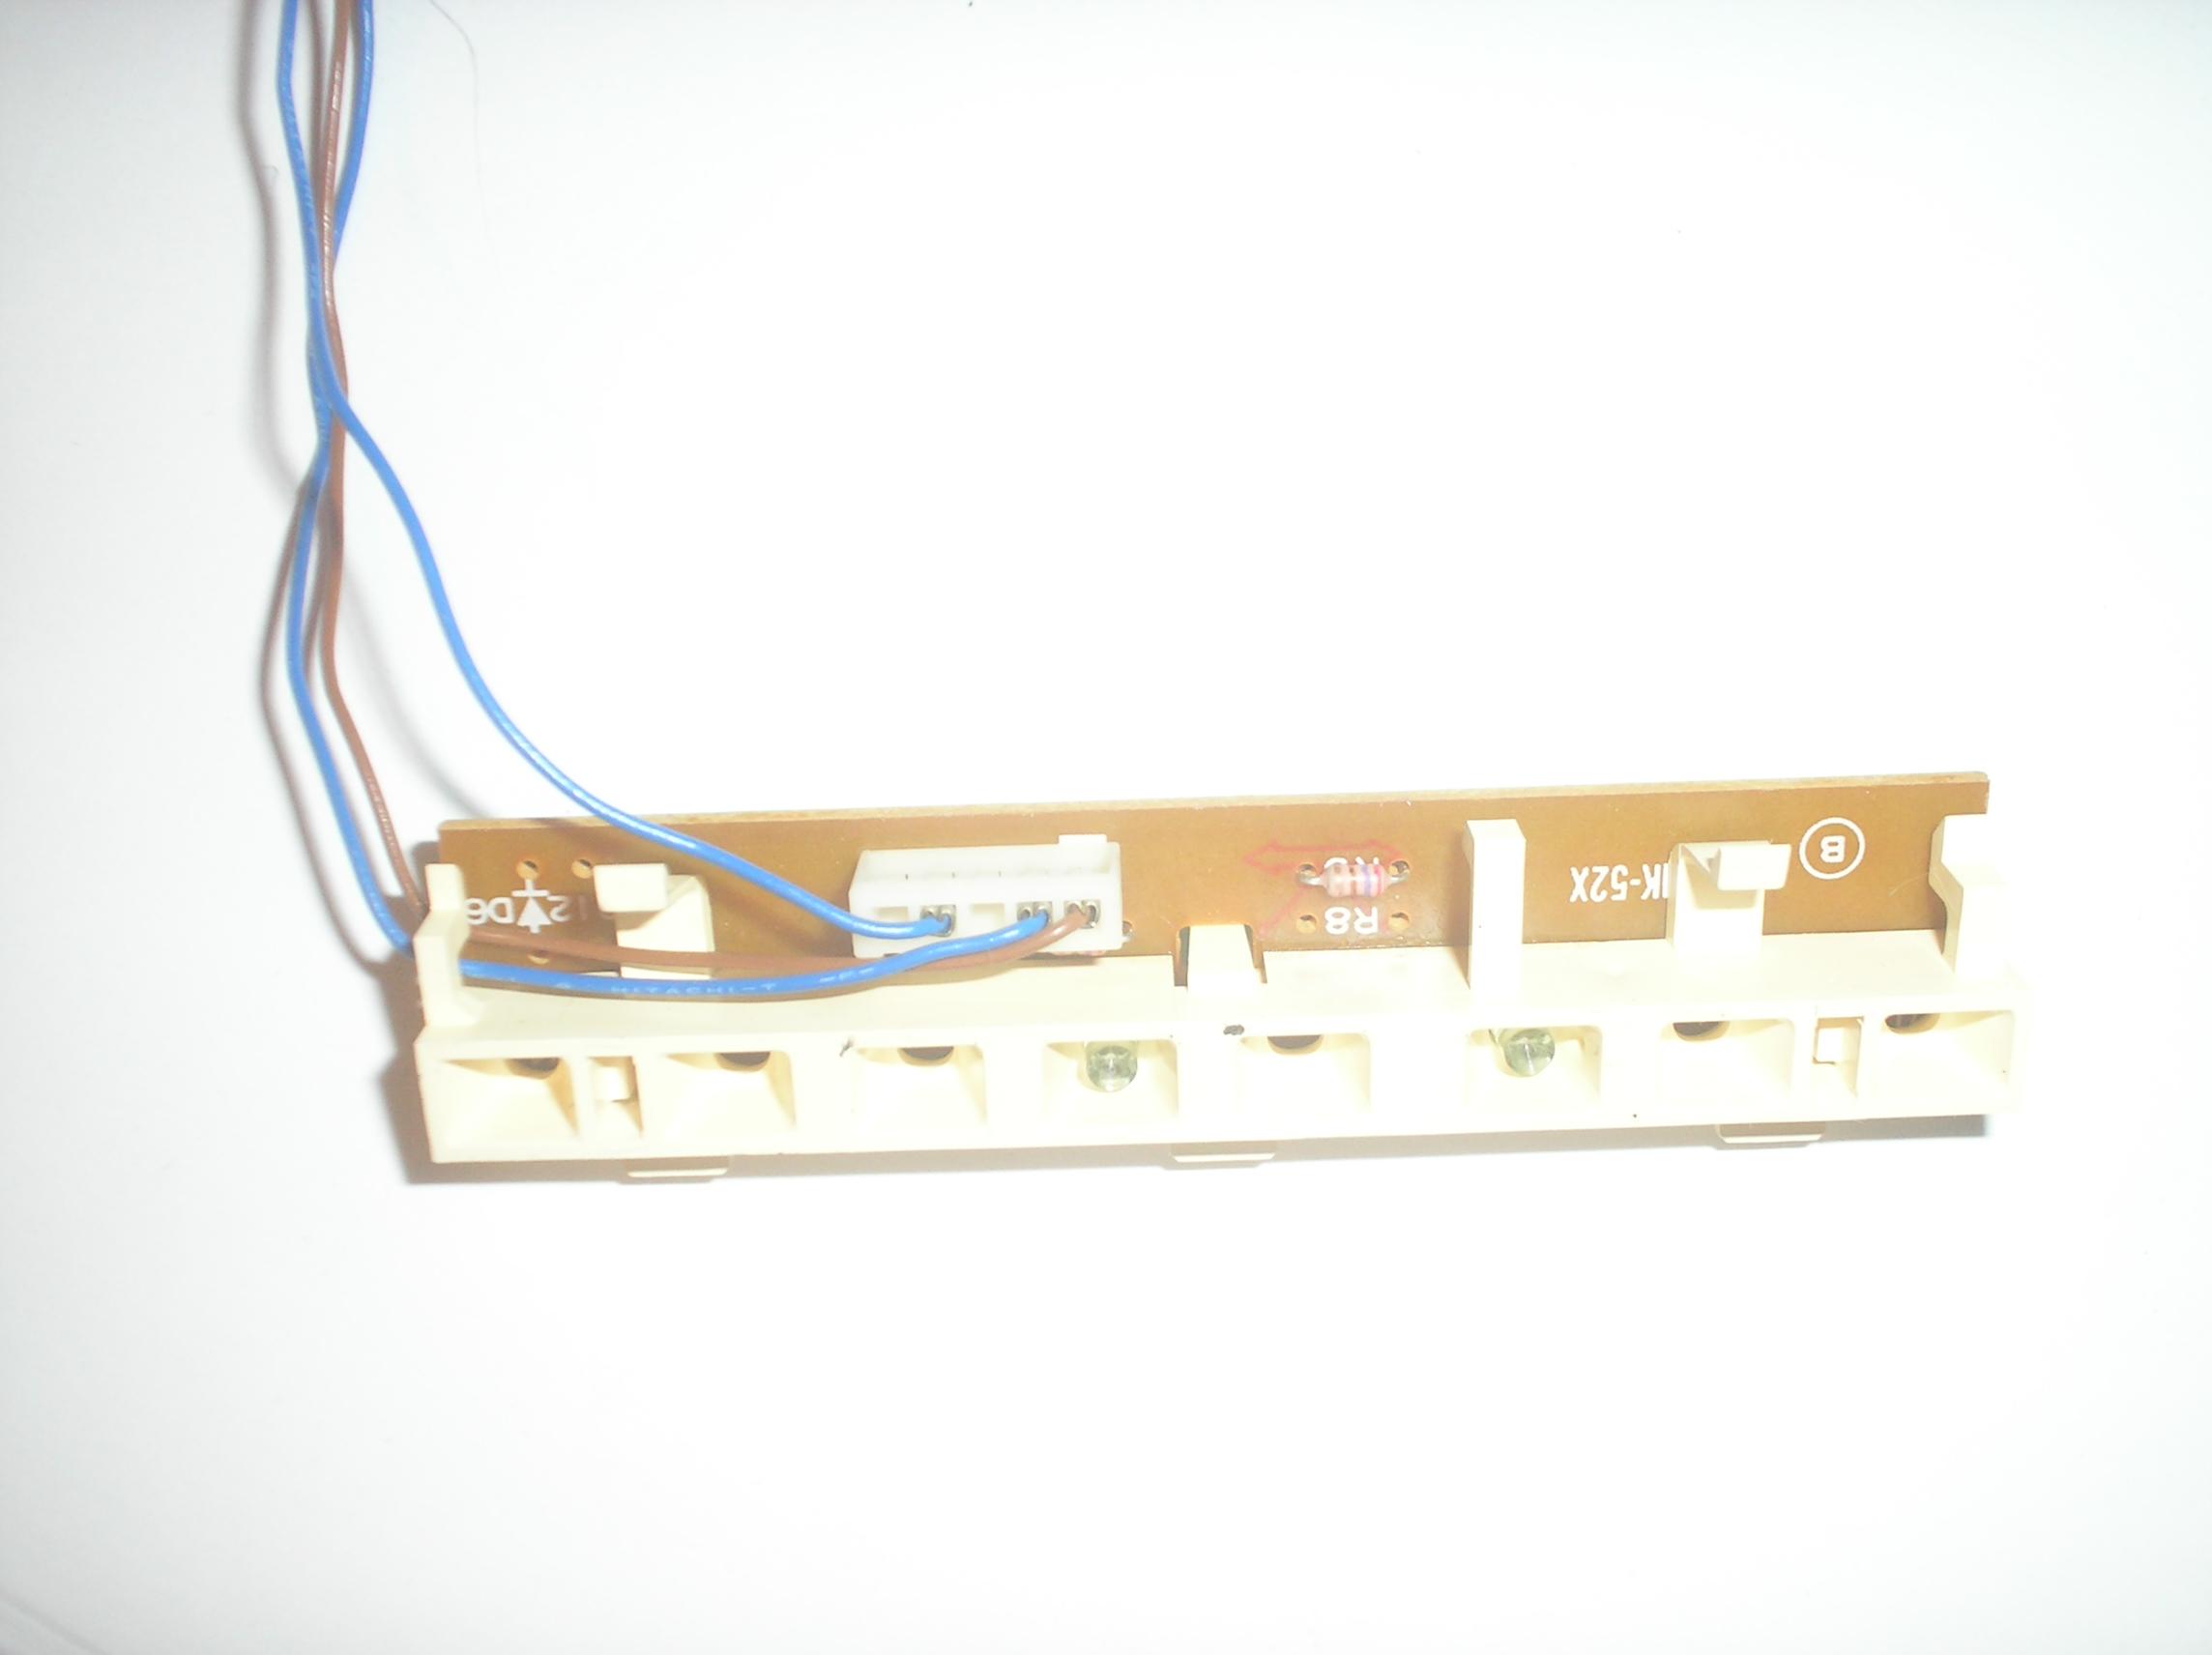 RS-T230 Cassette Deck B Tape Indicator Board Assy.  item is used. Deck B LED Block Assy  Technics part number SLNST230-KM1